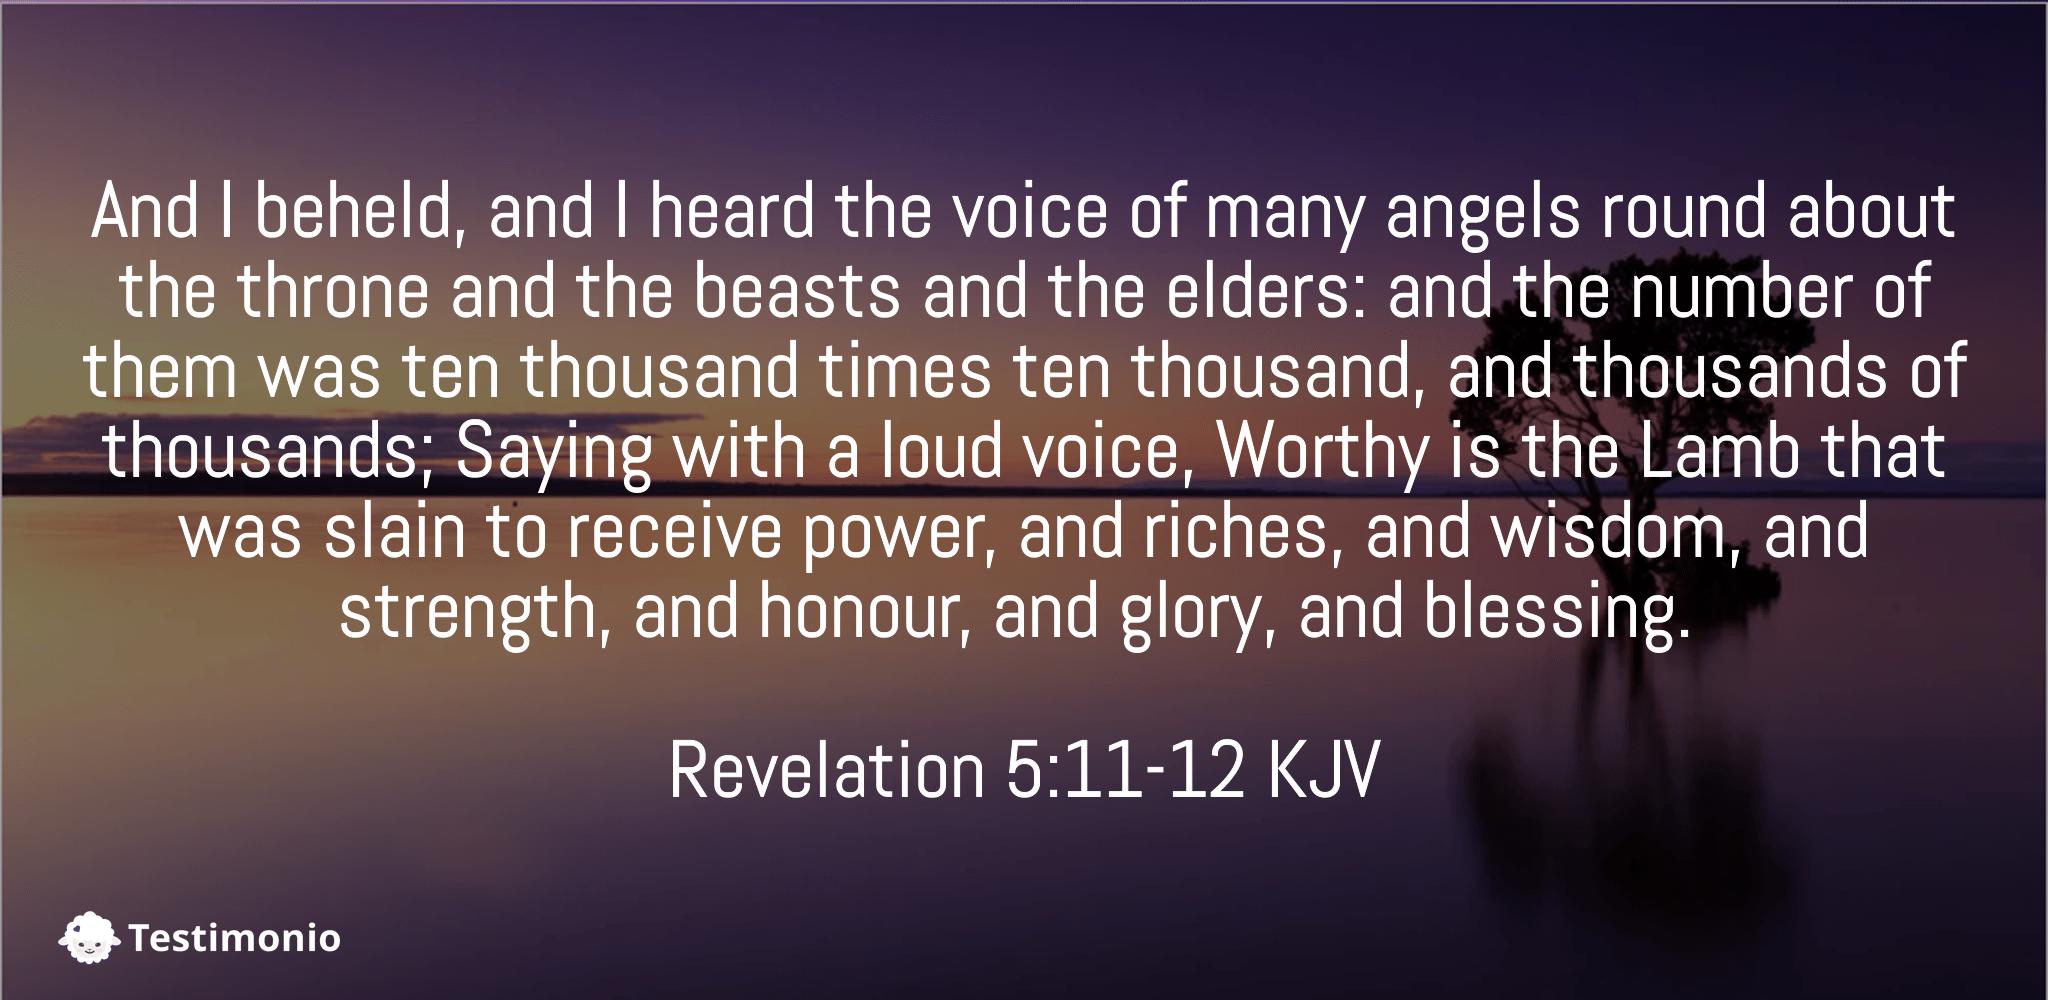 Revelation 5:11-12